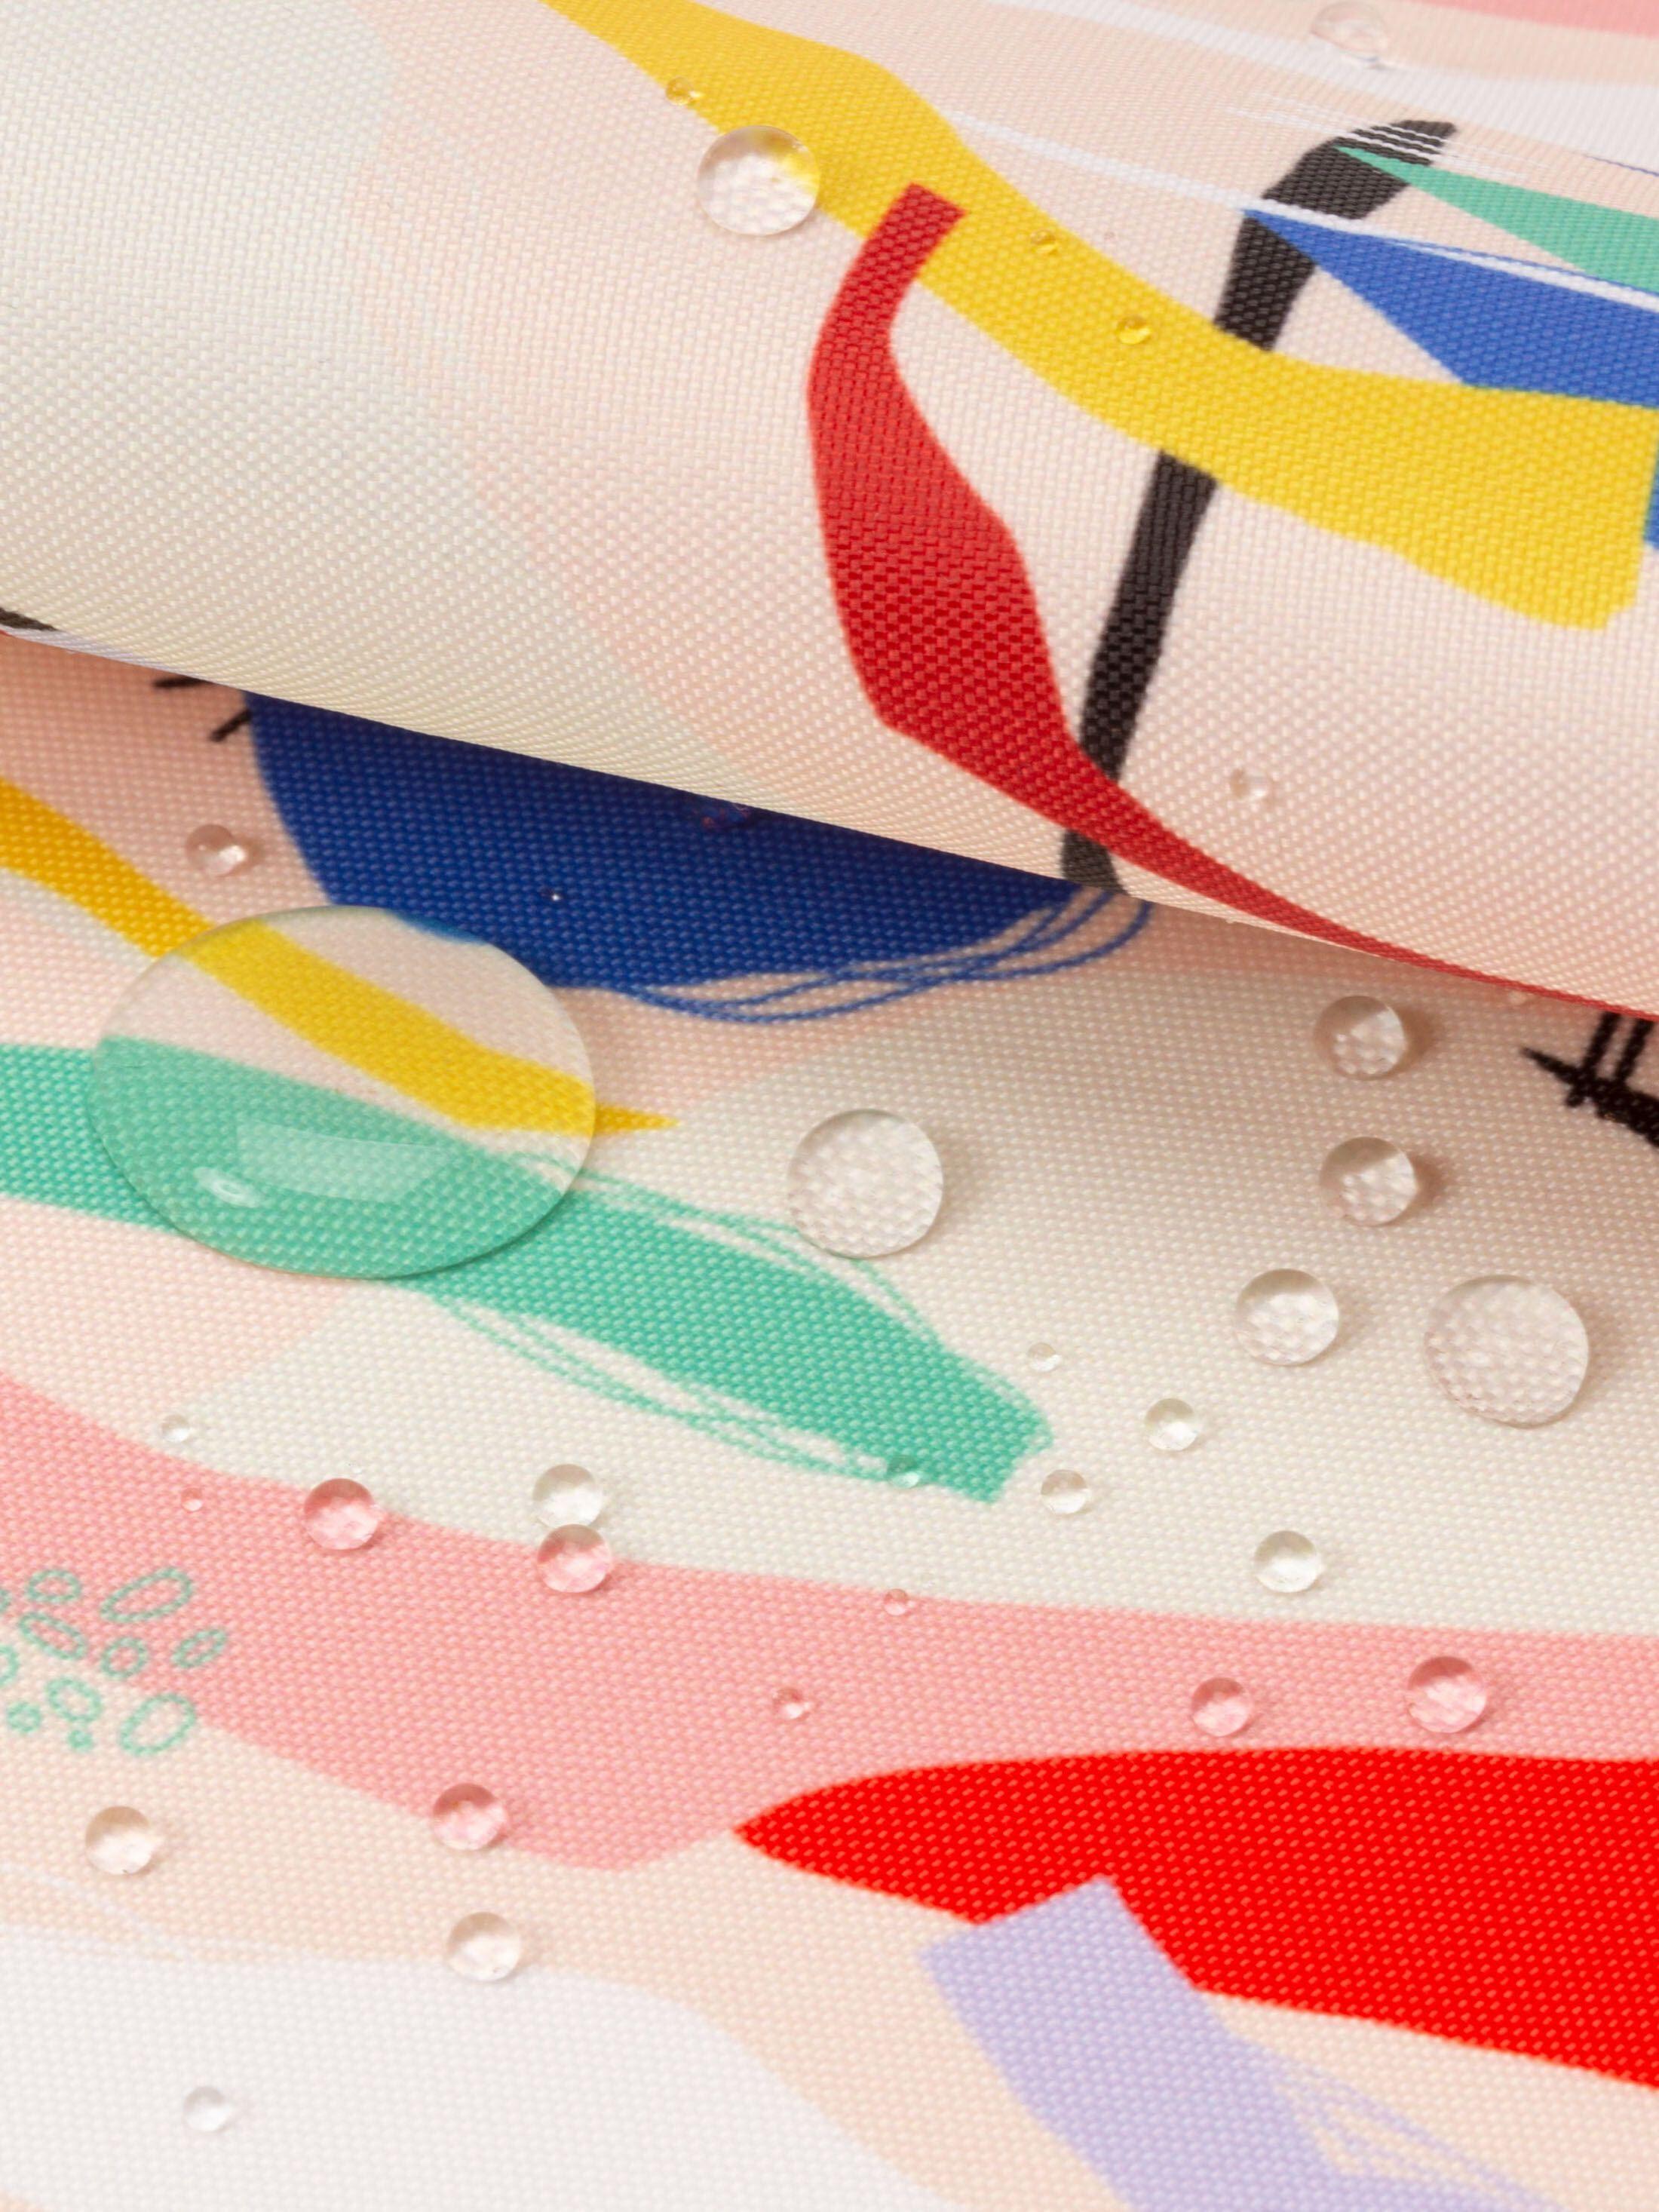 linden wasserfester stoff bedruckt